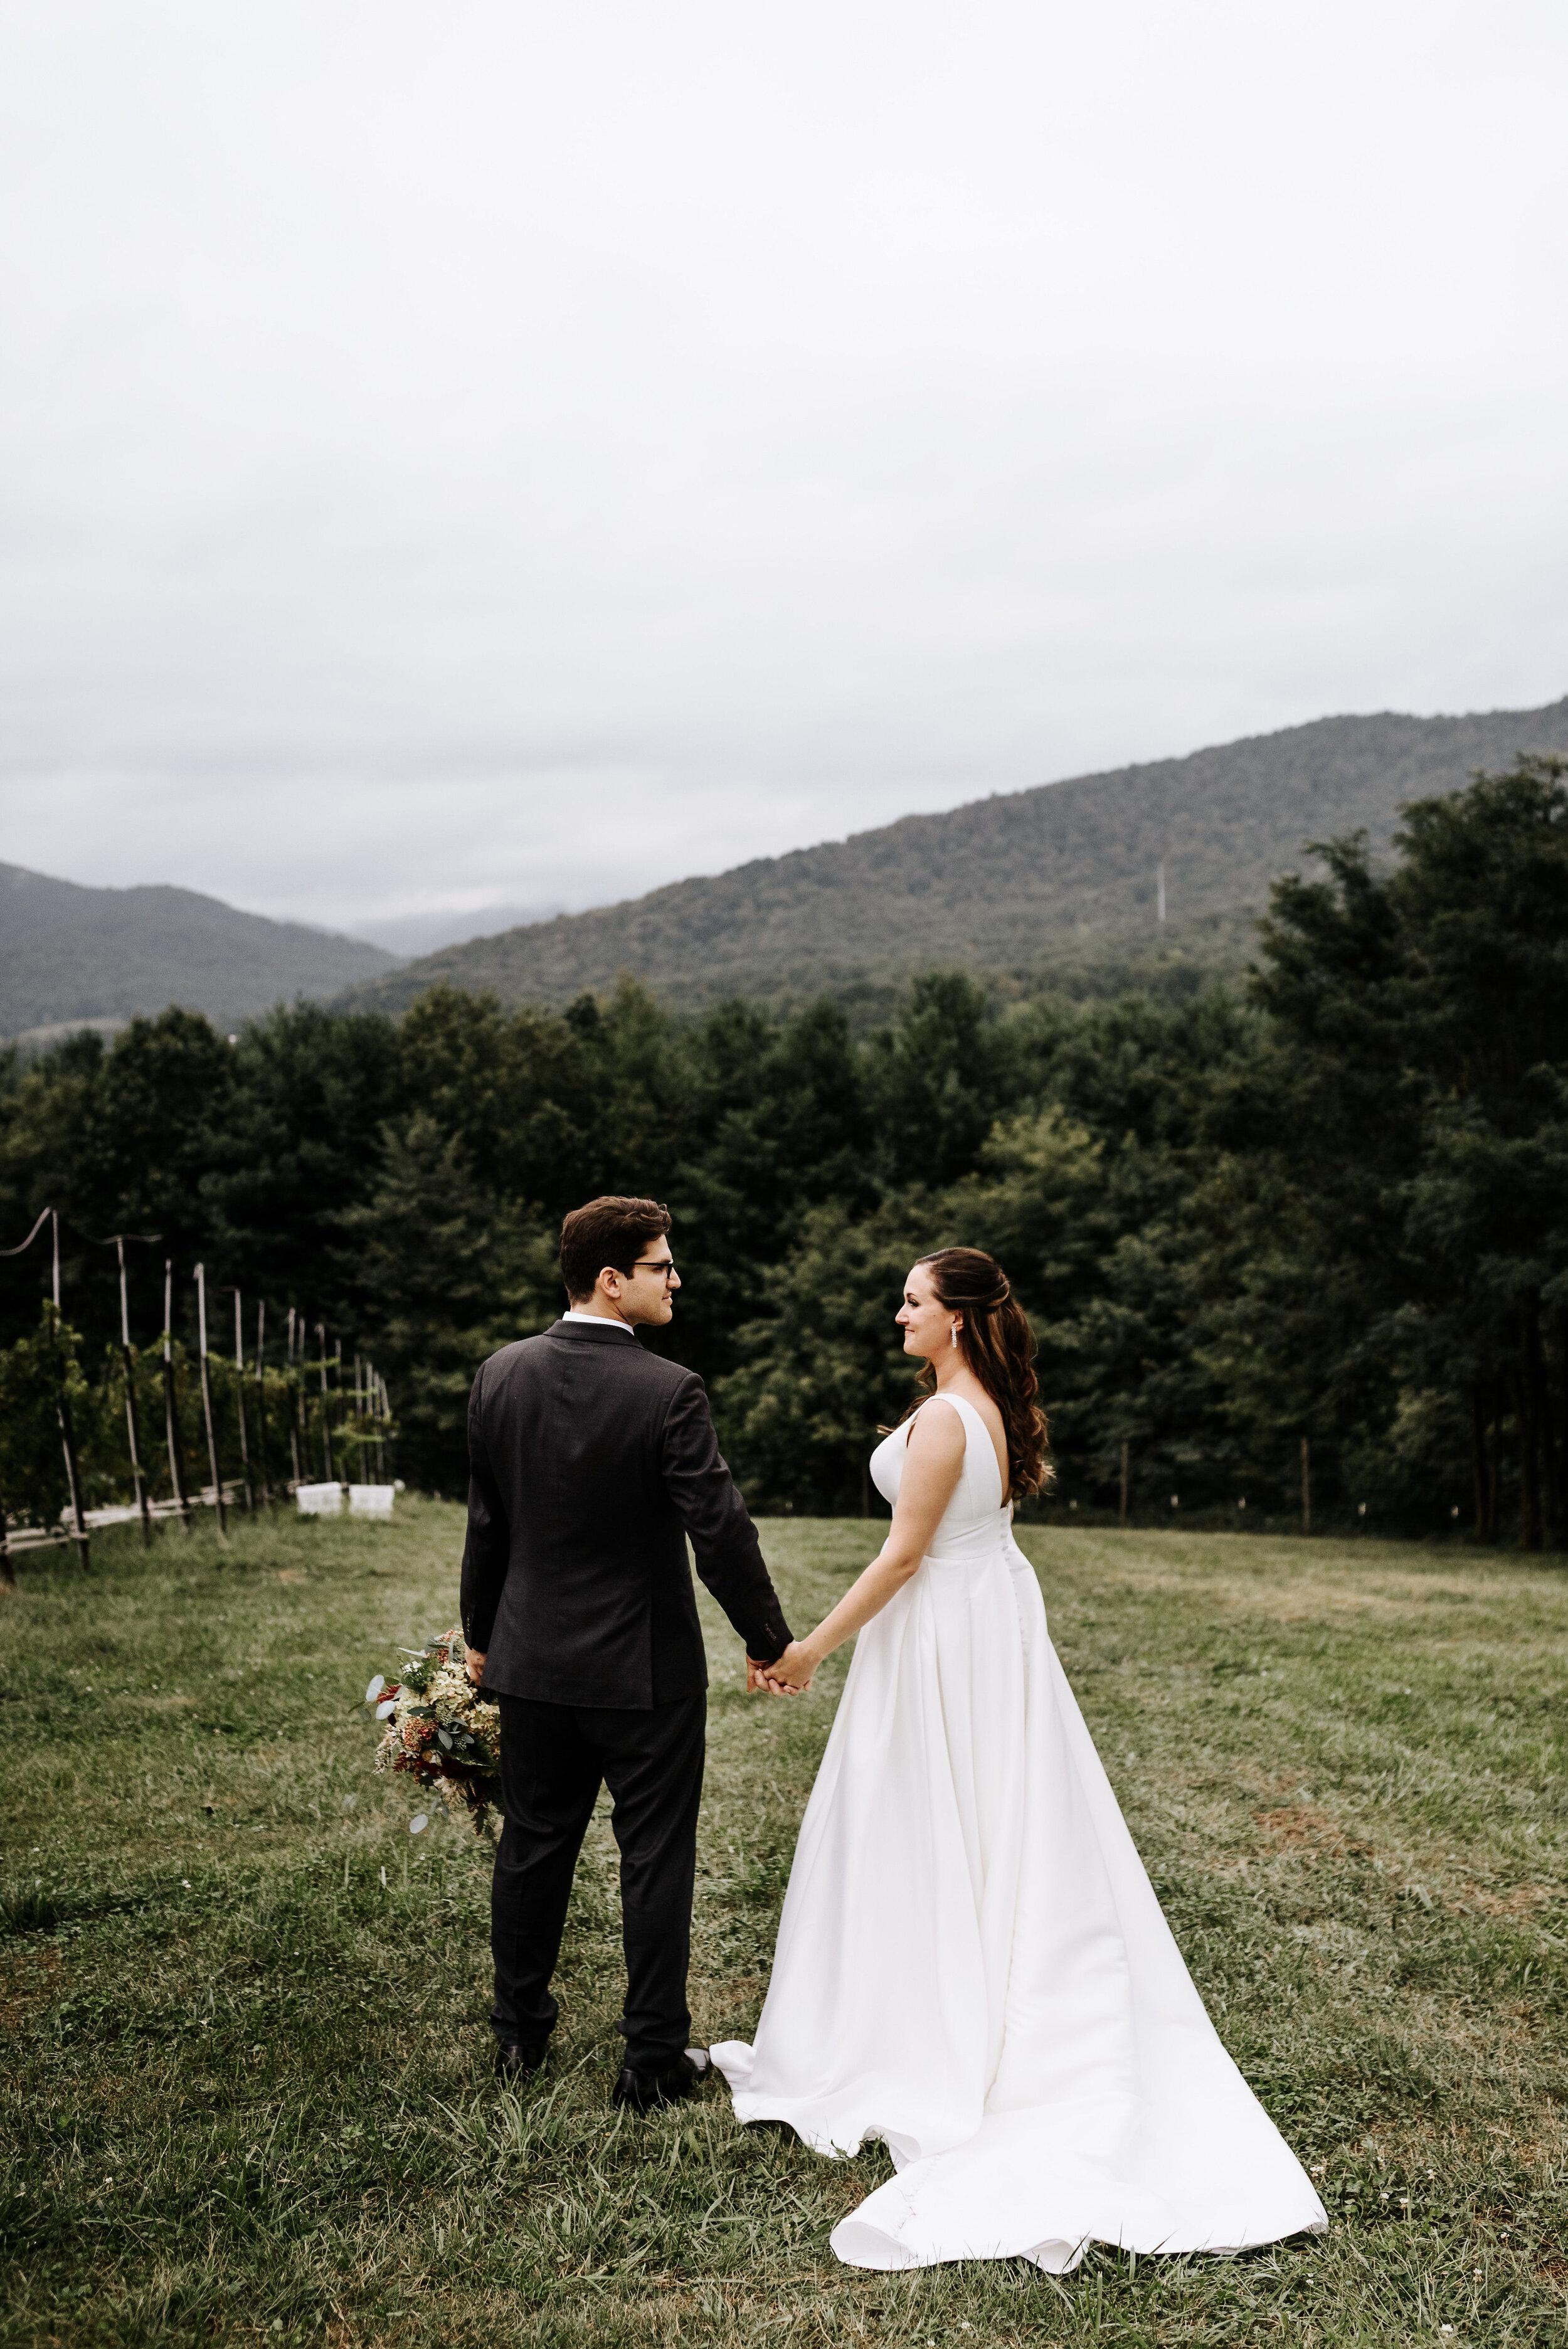 Allison_Nolan_Moss_Vineyards_Wedding_Charlottesville_Virginia_Photography_by_V_32.jpg